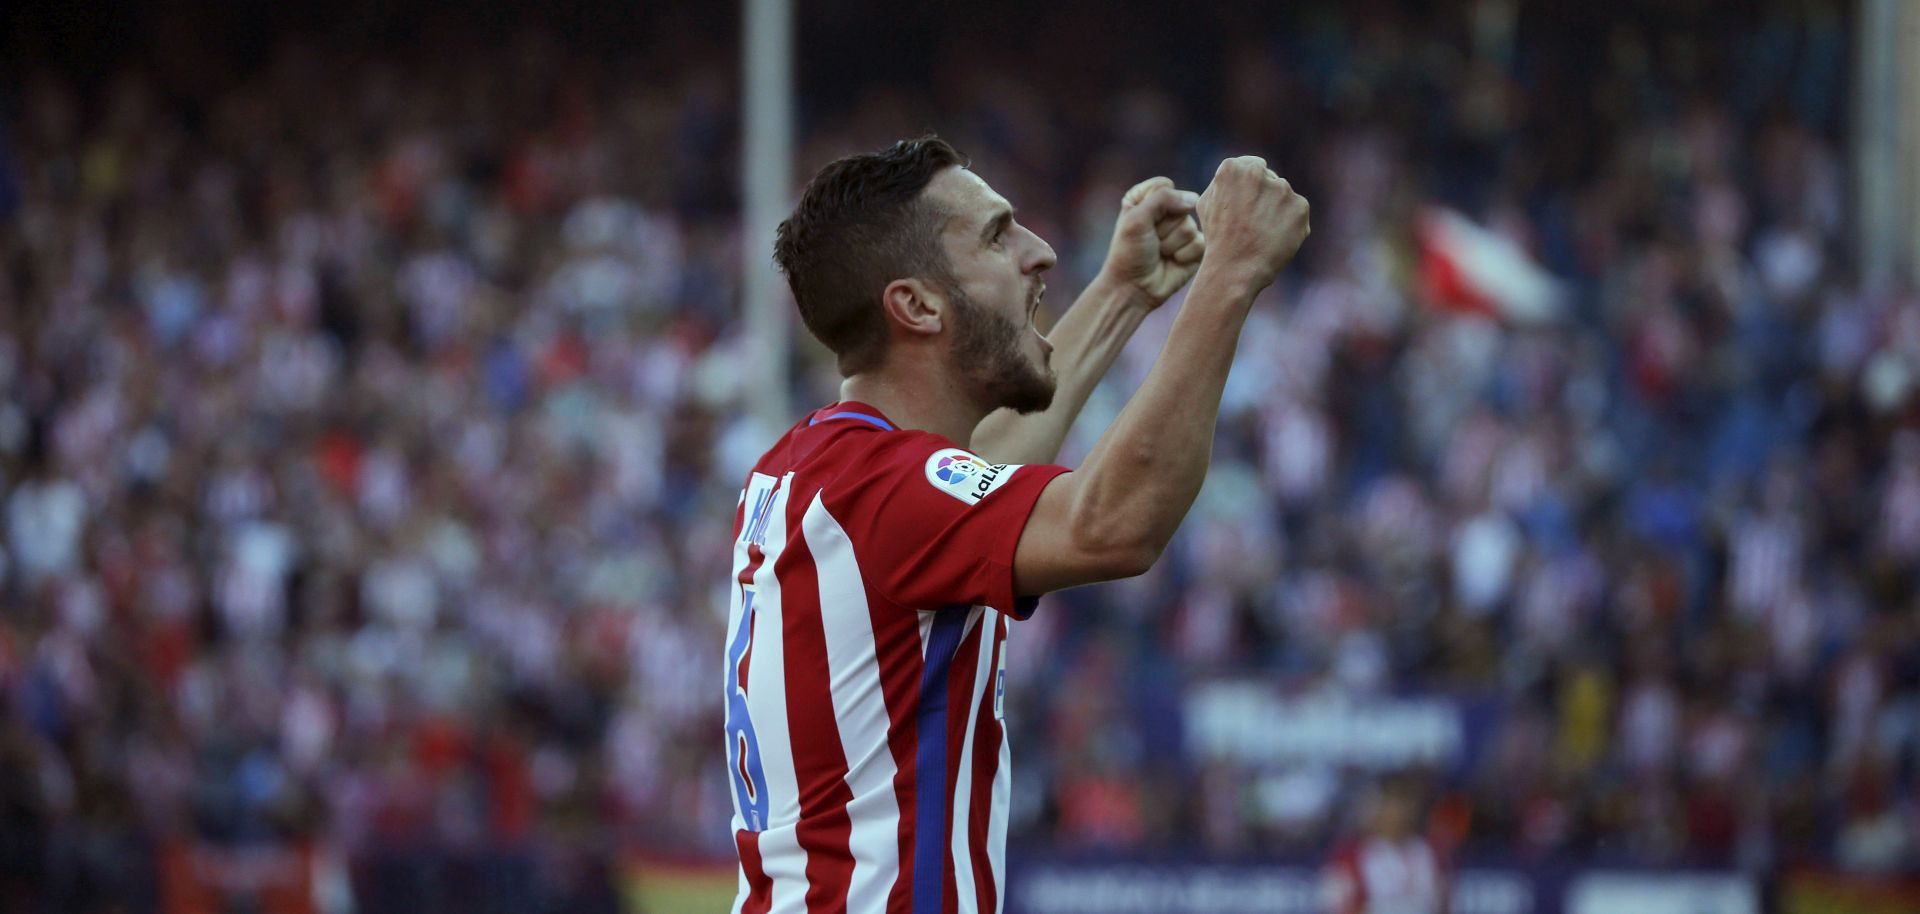 PRIMERA Atletico svladao Malagu, Torres dvostruki asistent